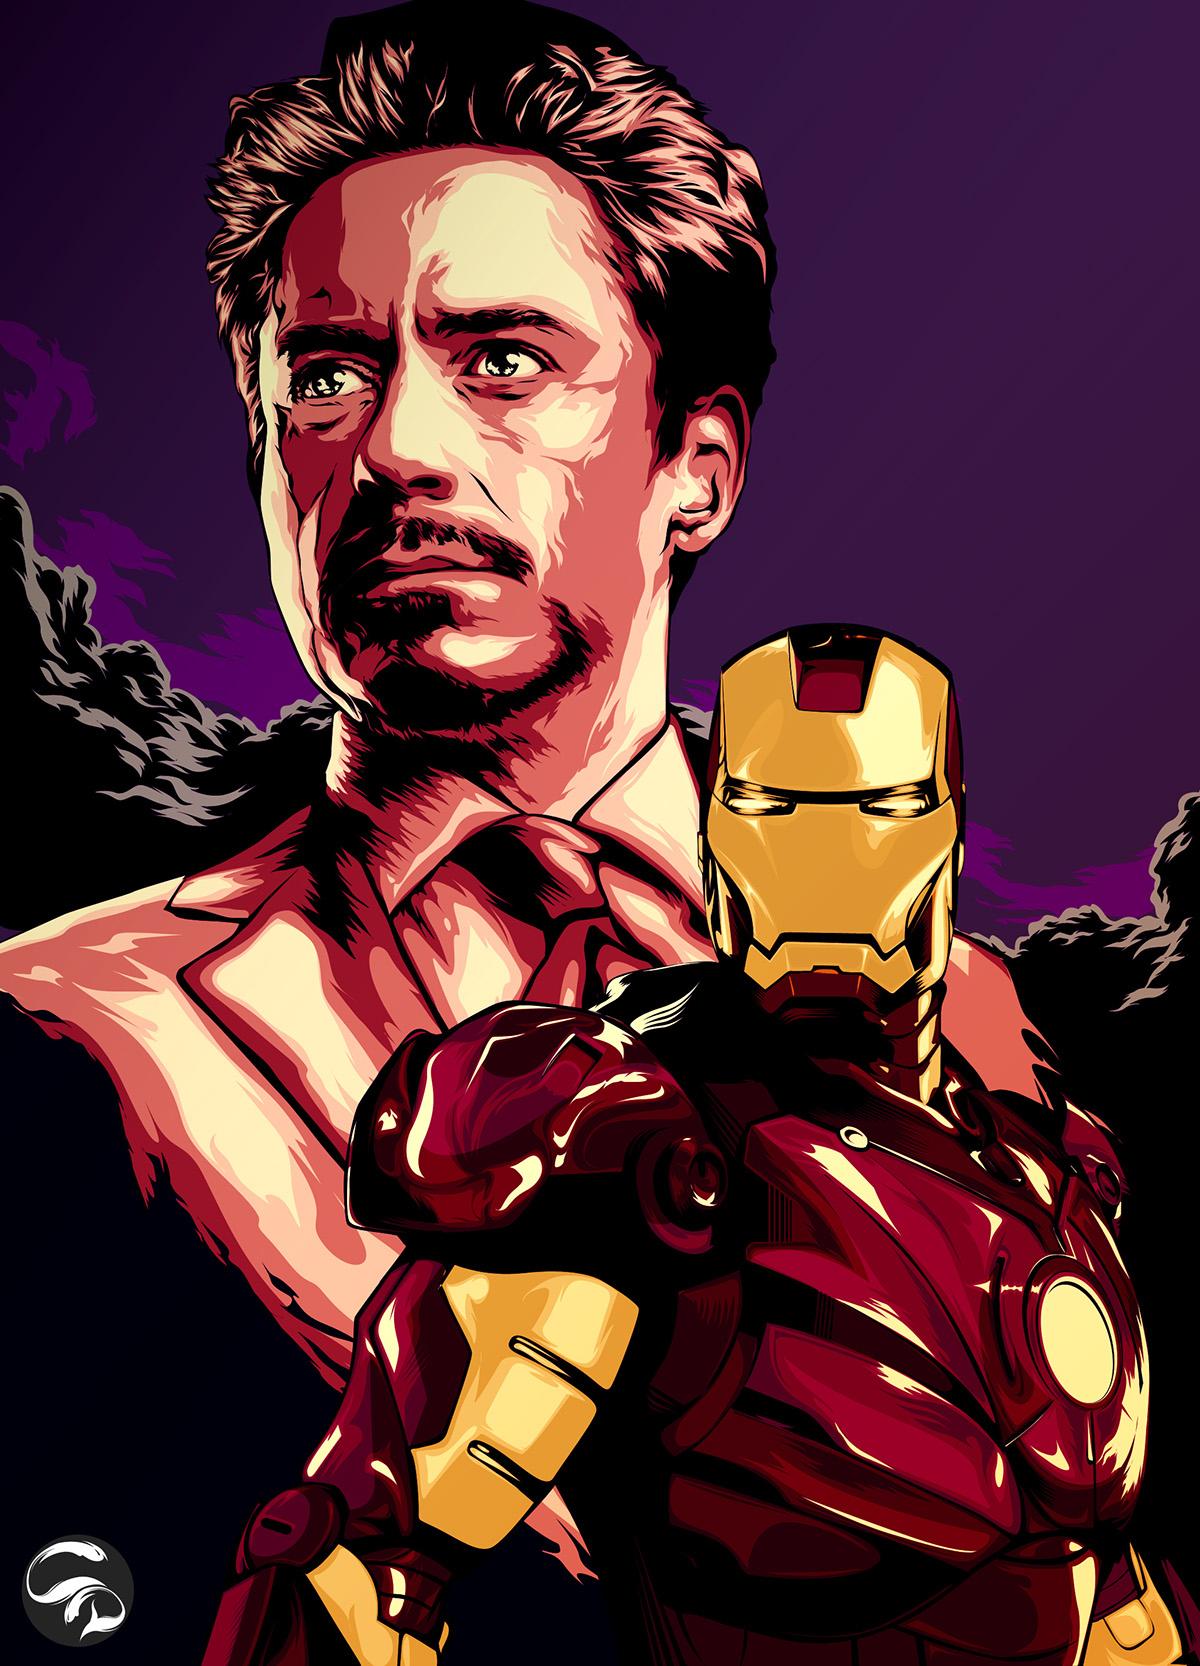 iron-man-2-still-tony-stark  |Tony Stark Iron Man 2 Hair